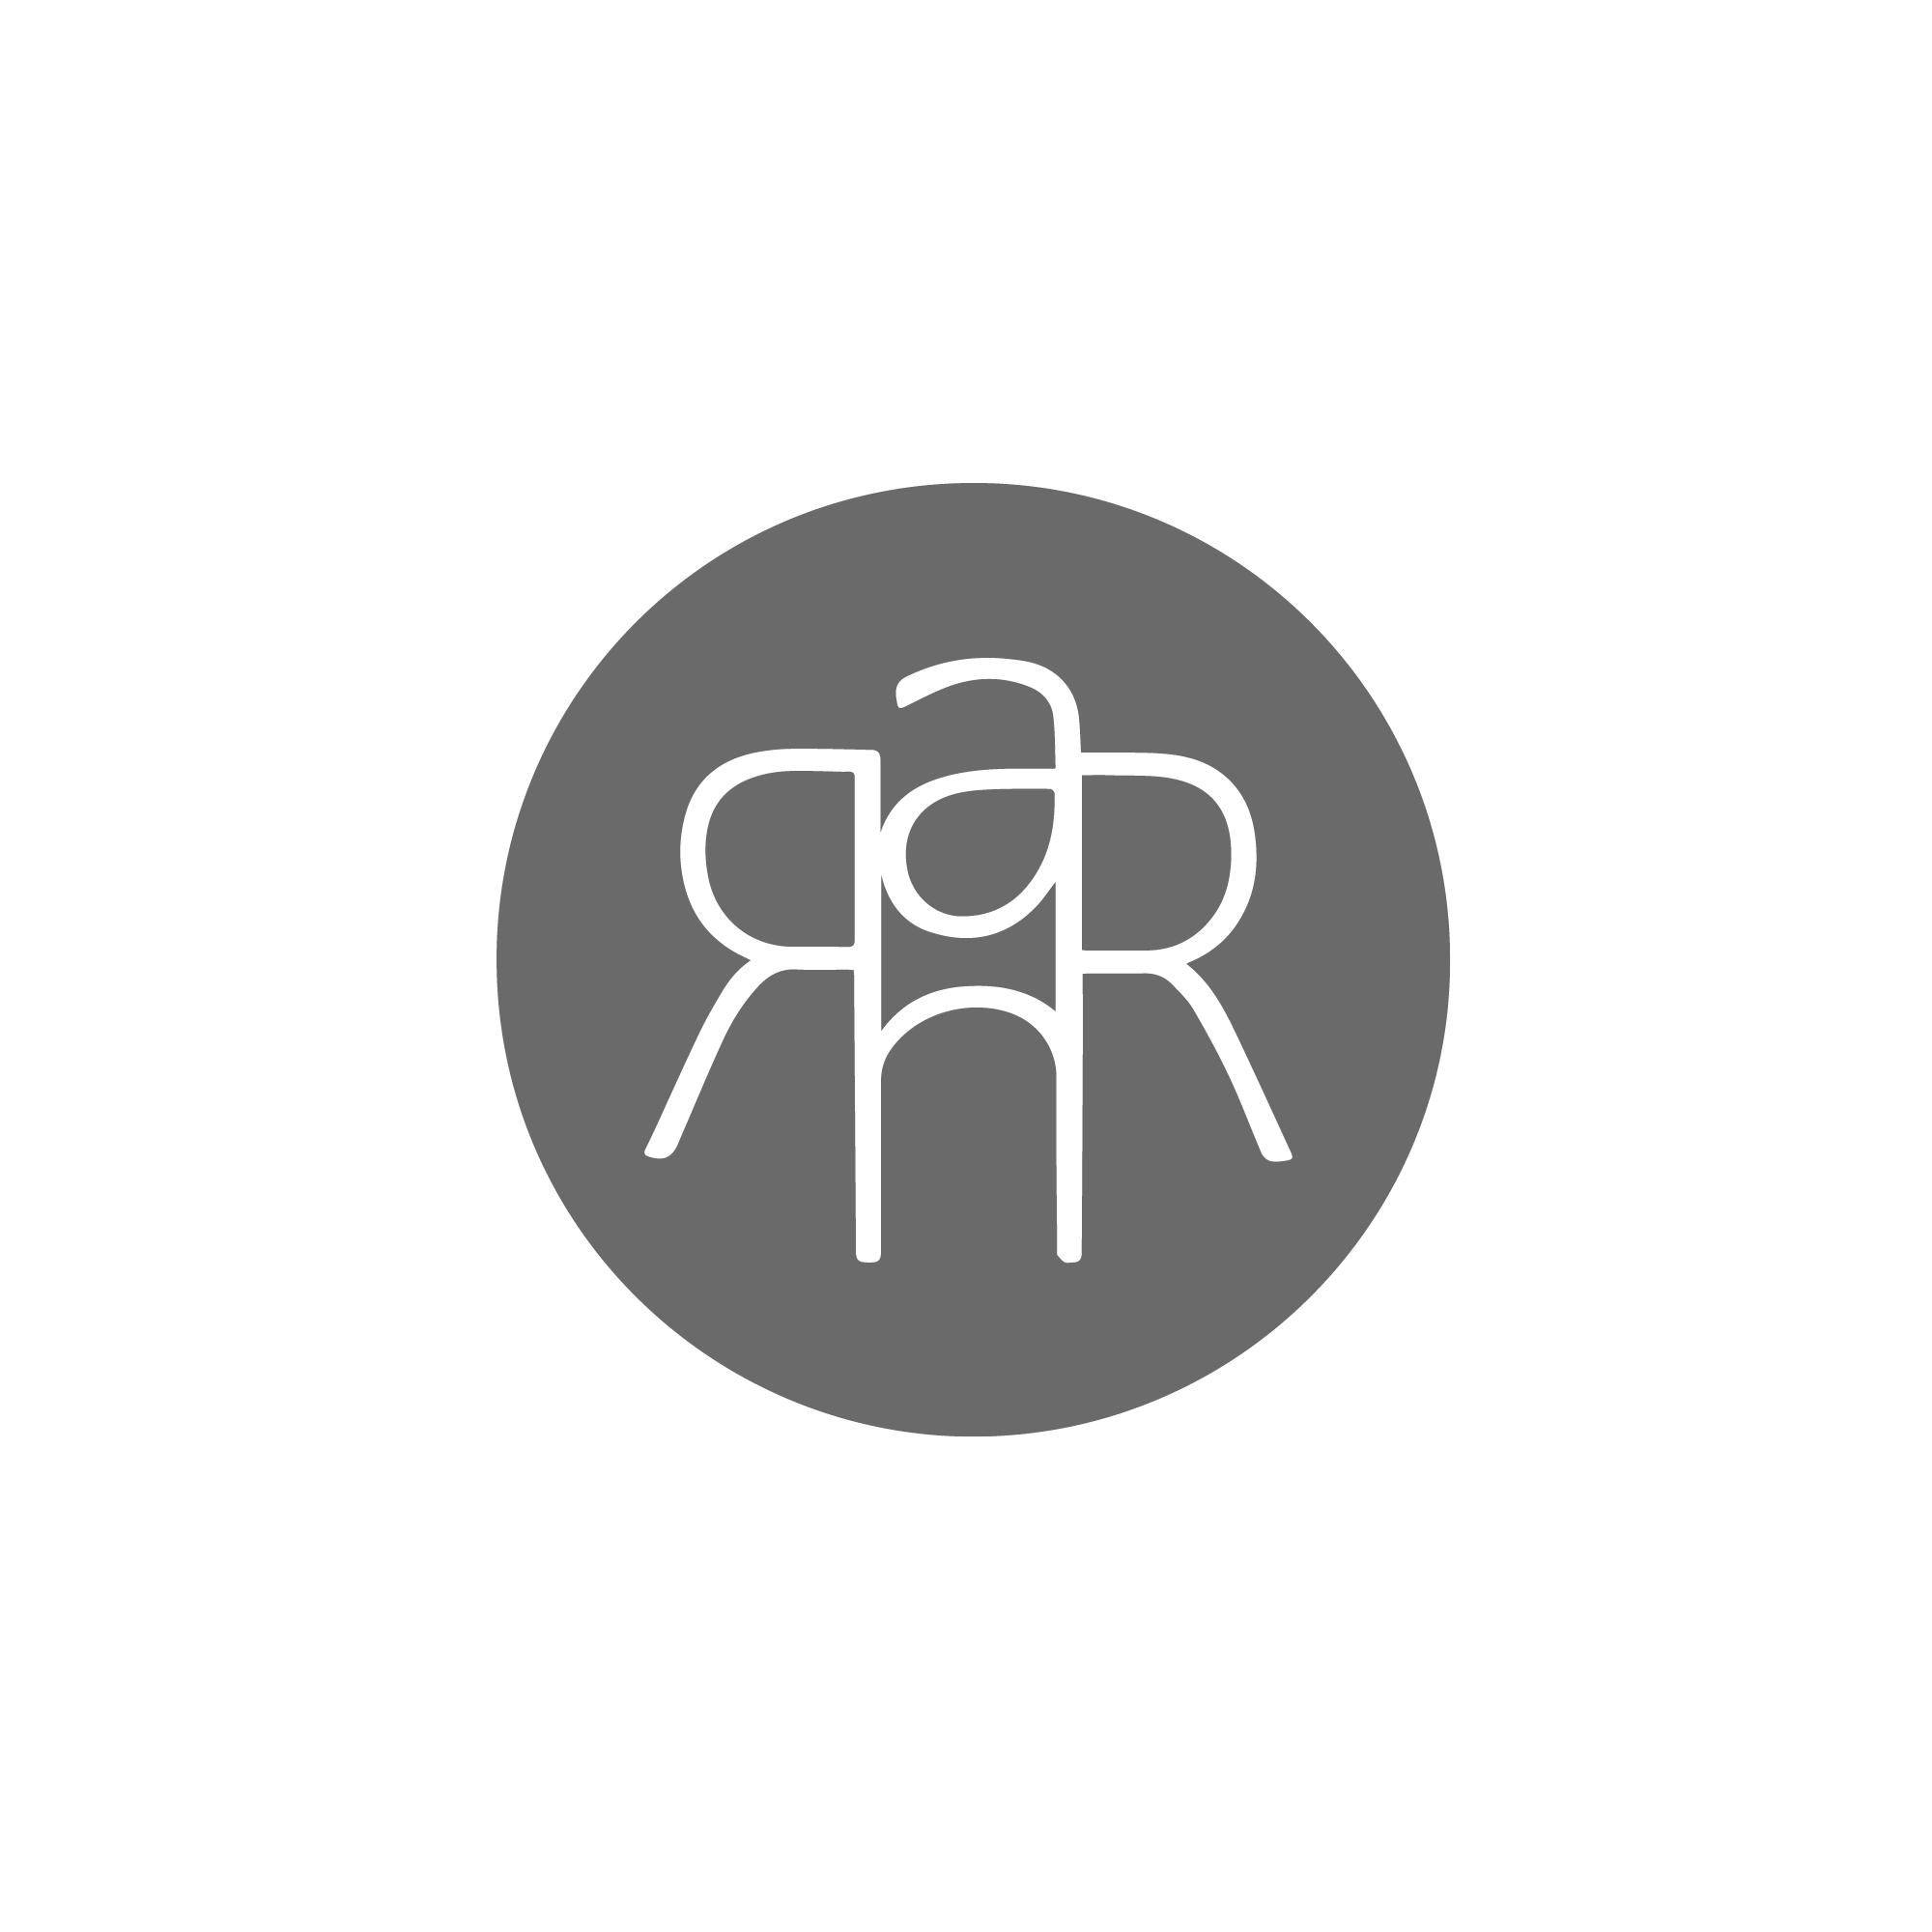 Rahr sponsor logo